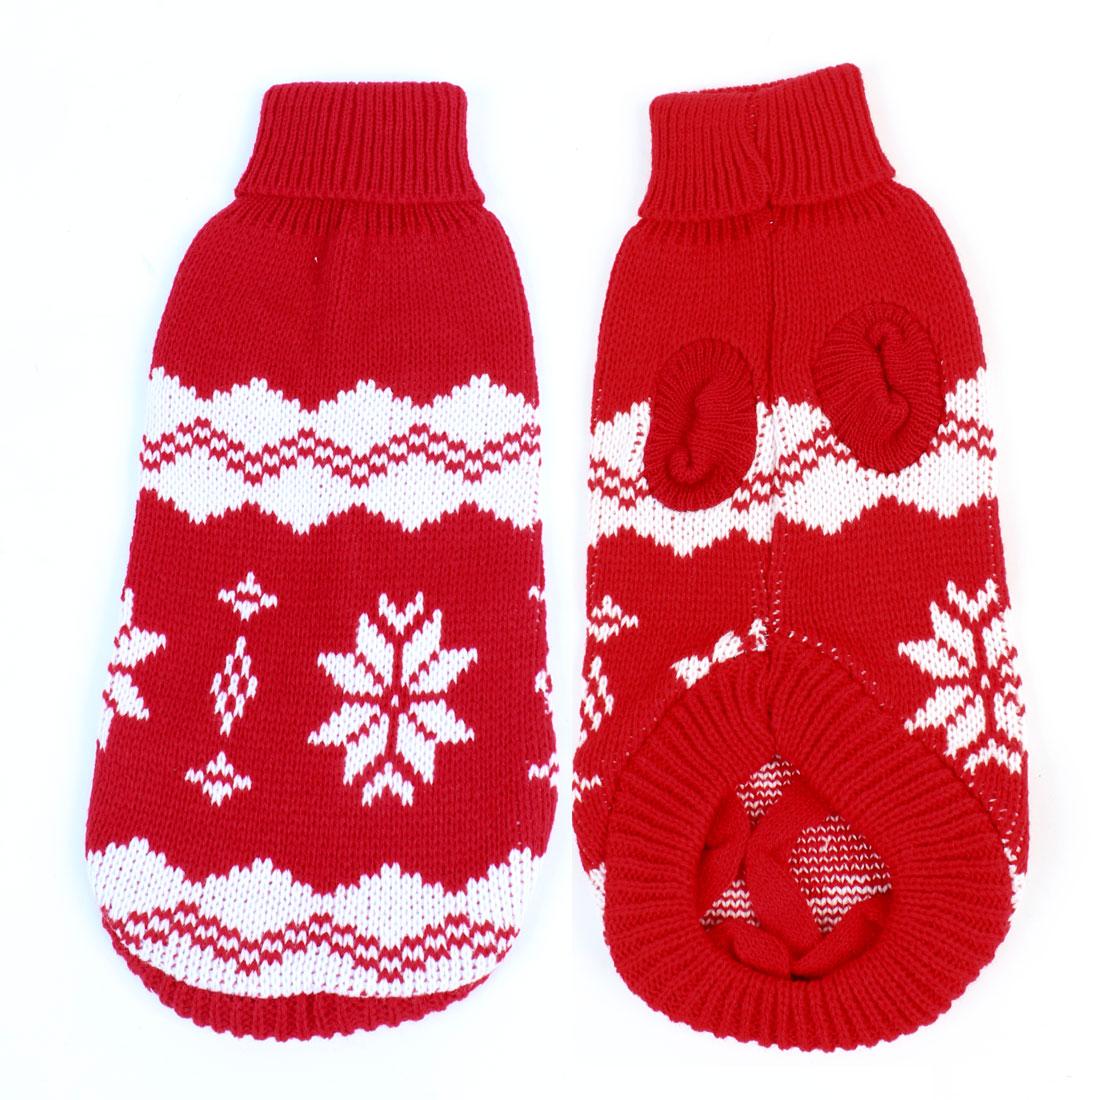 Pet Dog Acrylic Flower Pattern Winter Warm Turtleneck Sweater Coat White Red Size 10